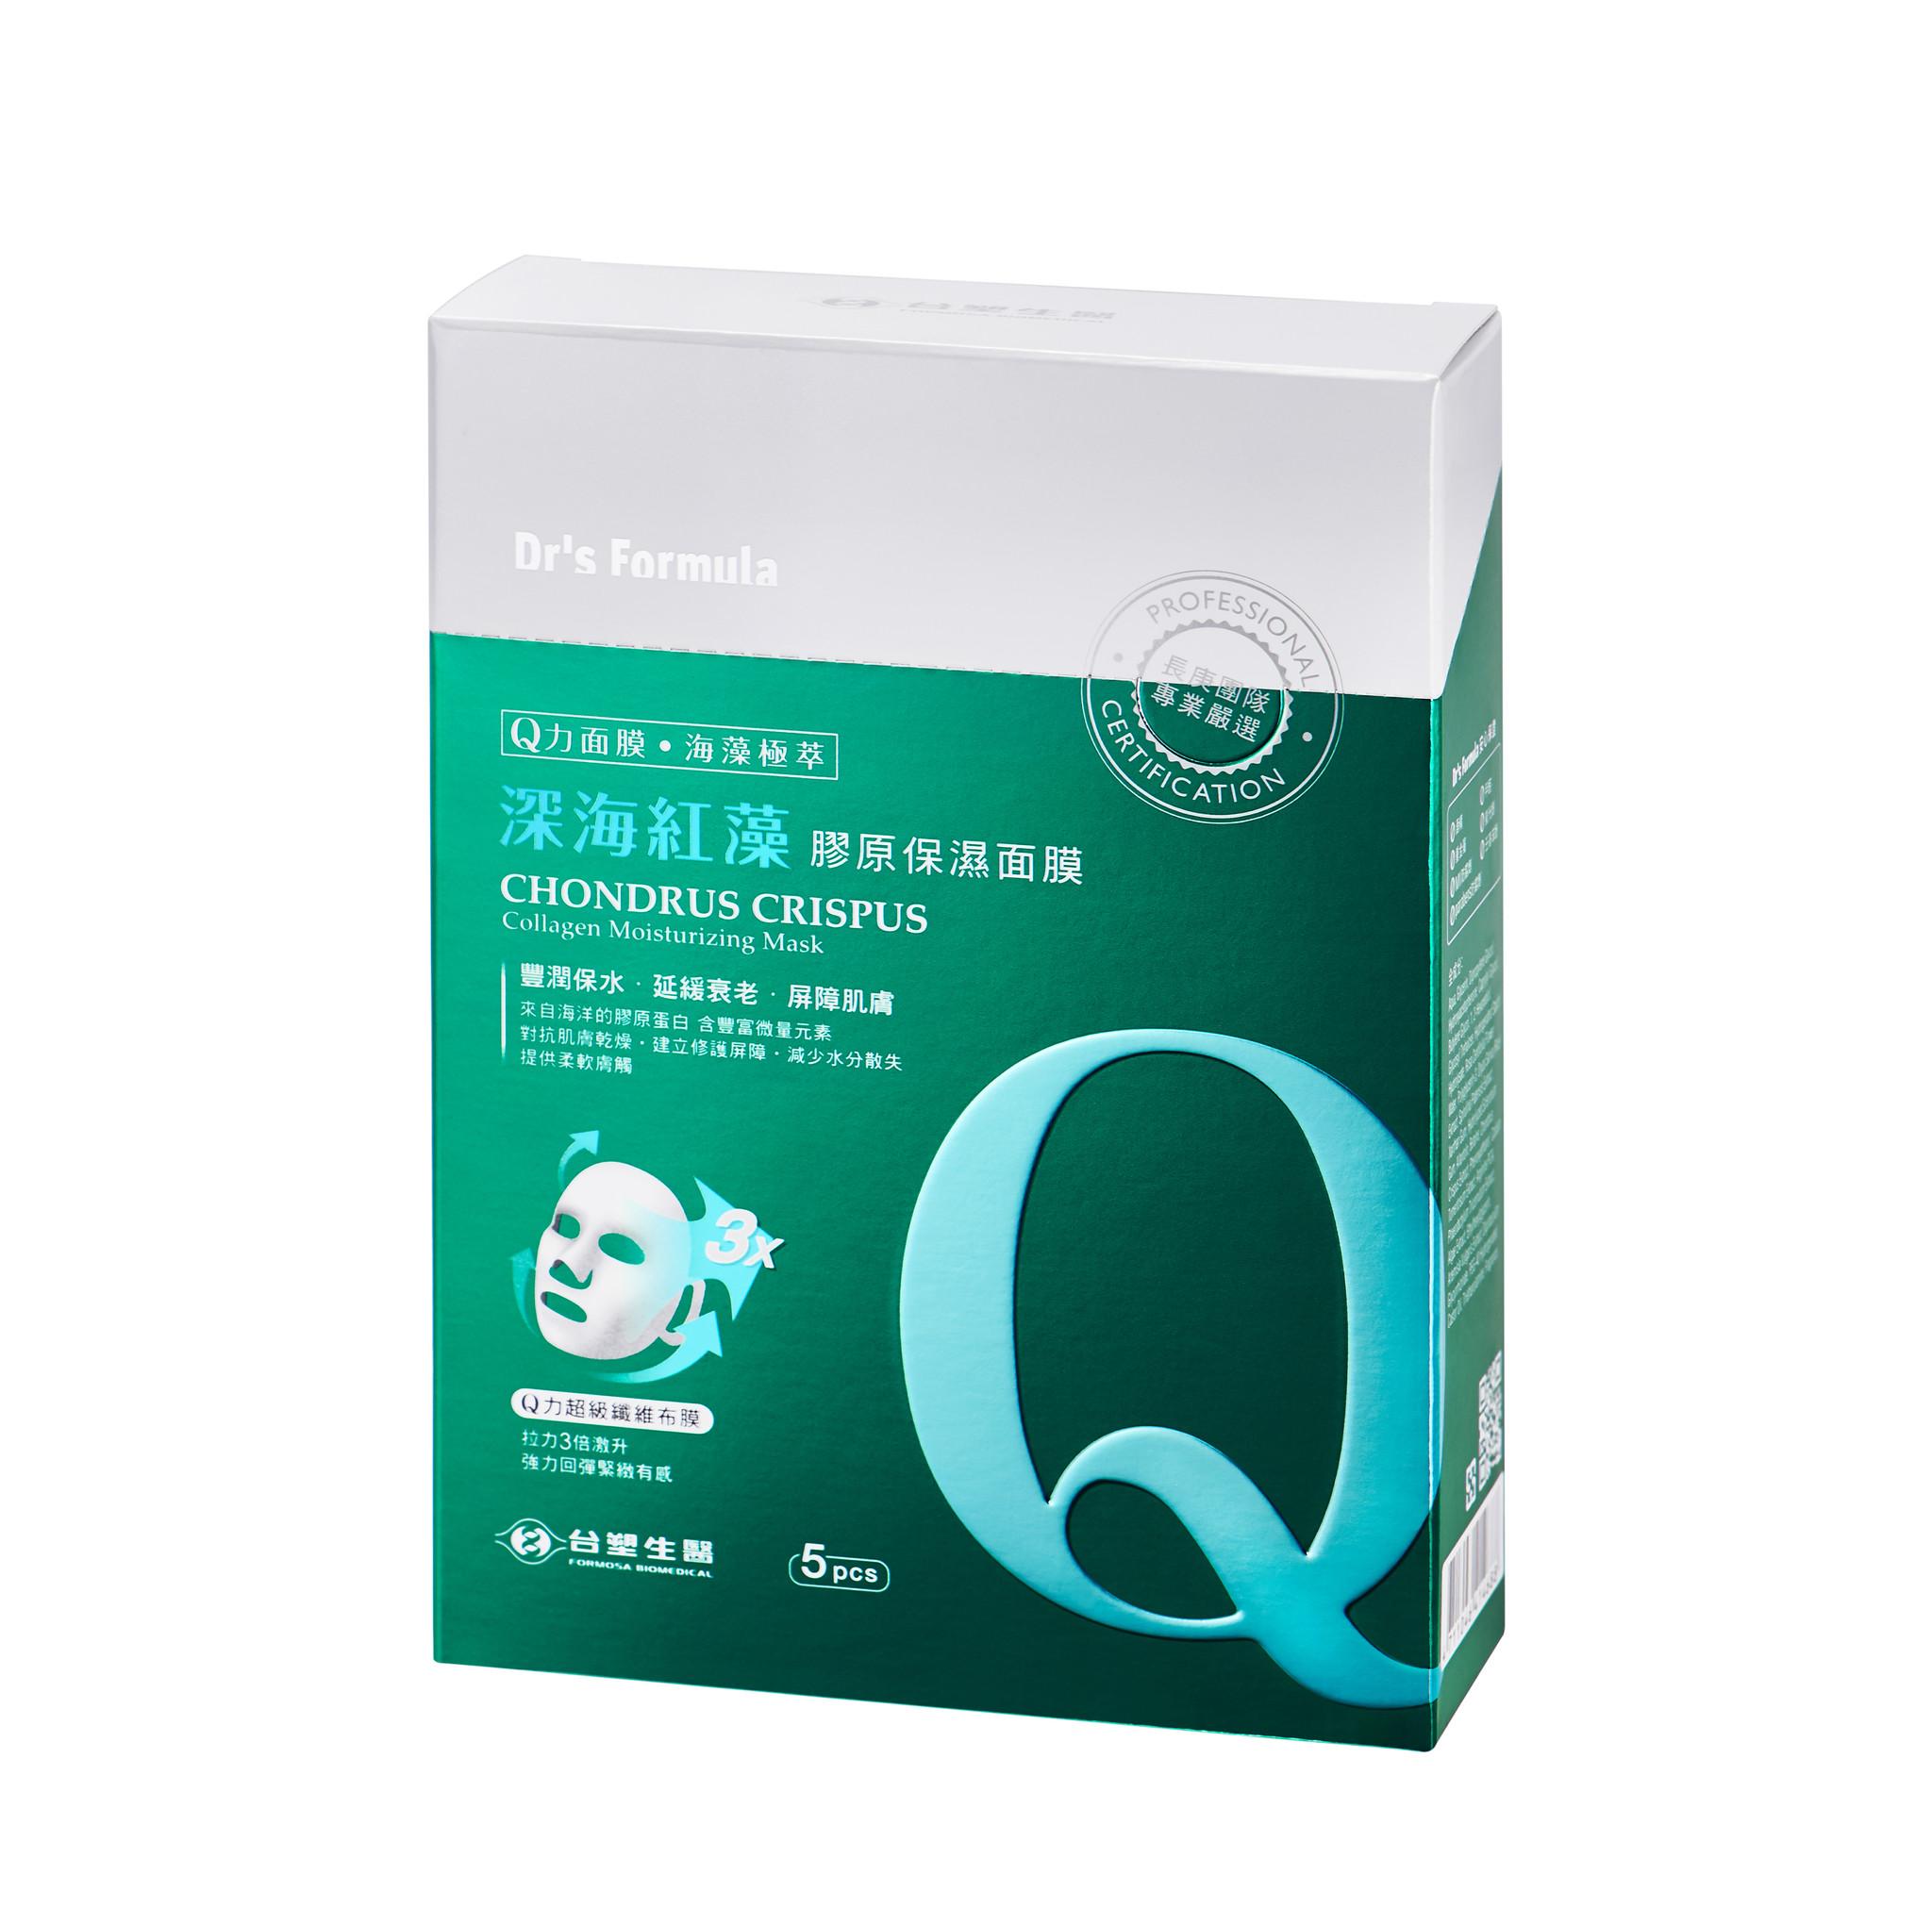 Chondrus Crispus Collagen Moisturizing Mask (5 pcs)-1